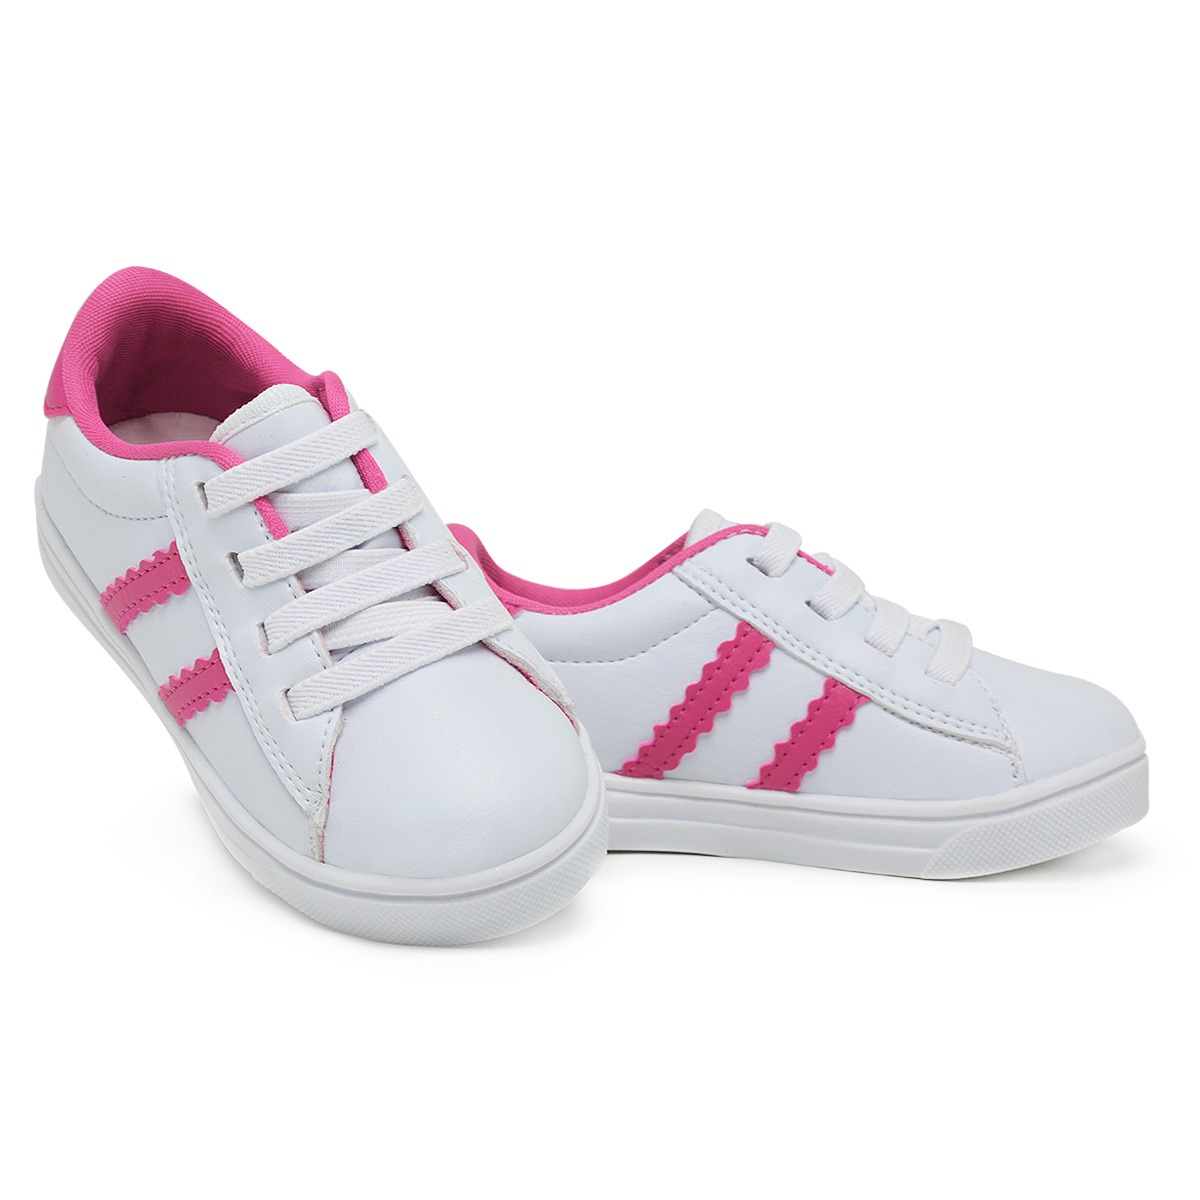 Tênis Infantil 3ls3 Branco Rosa